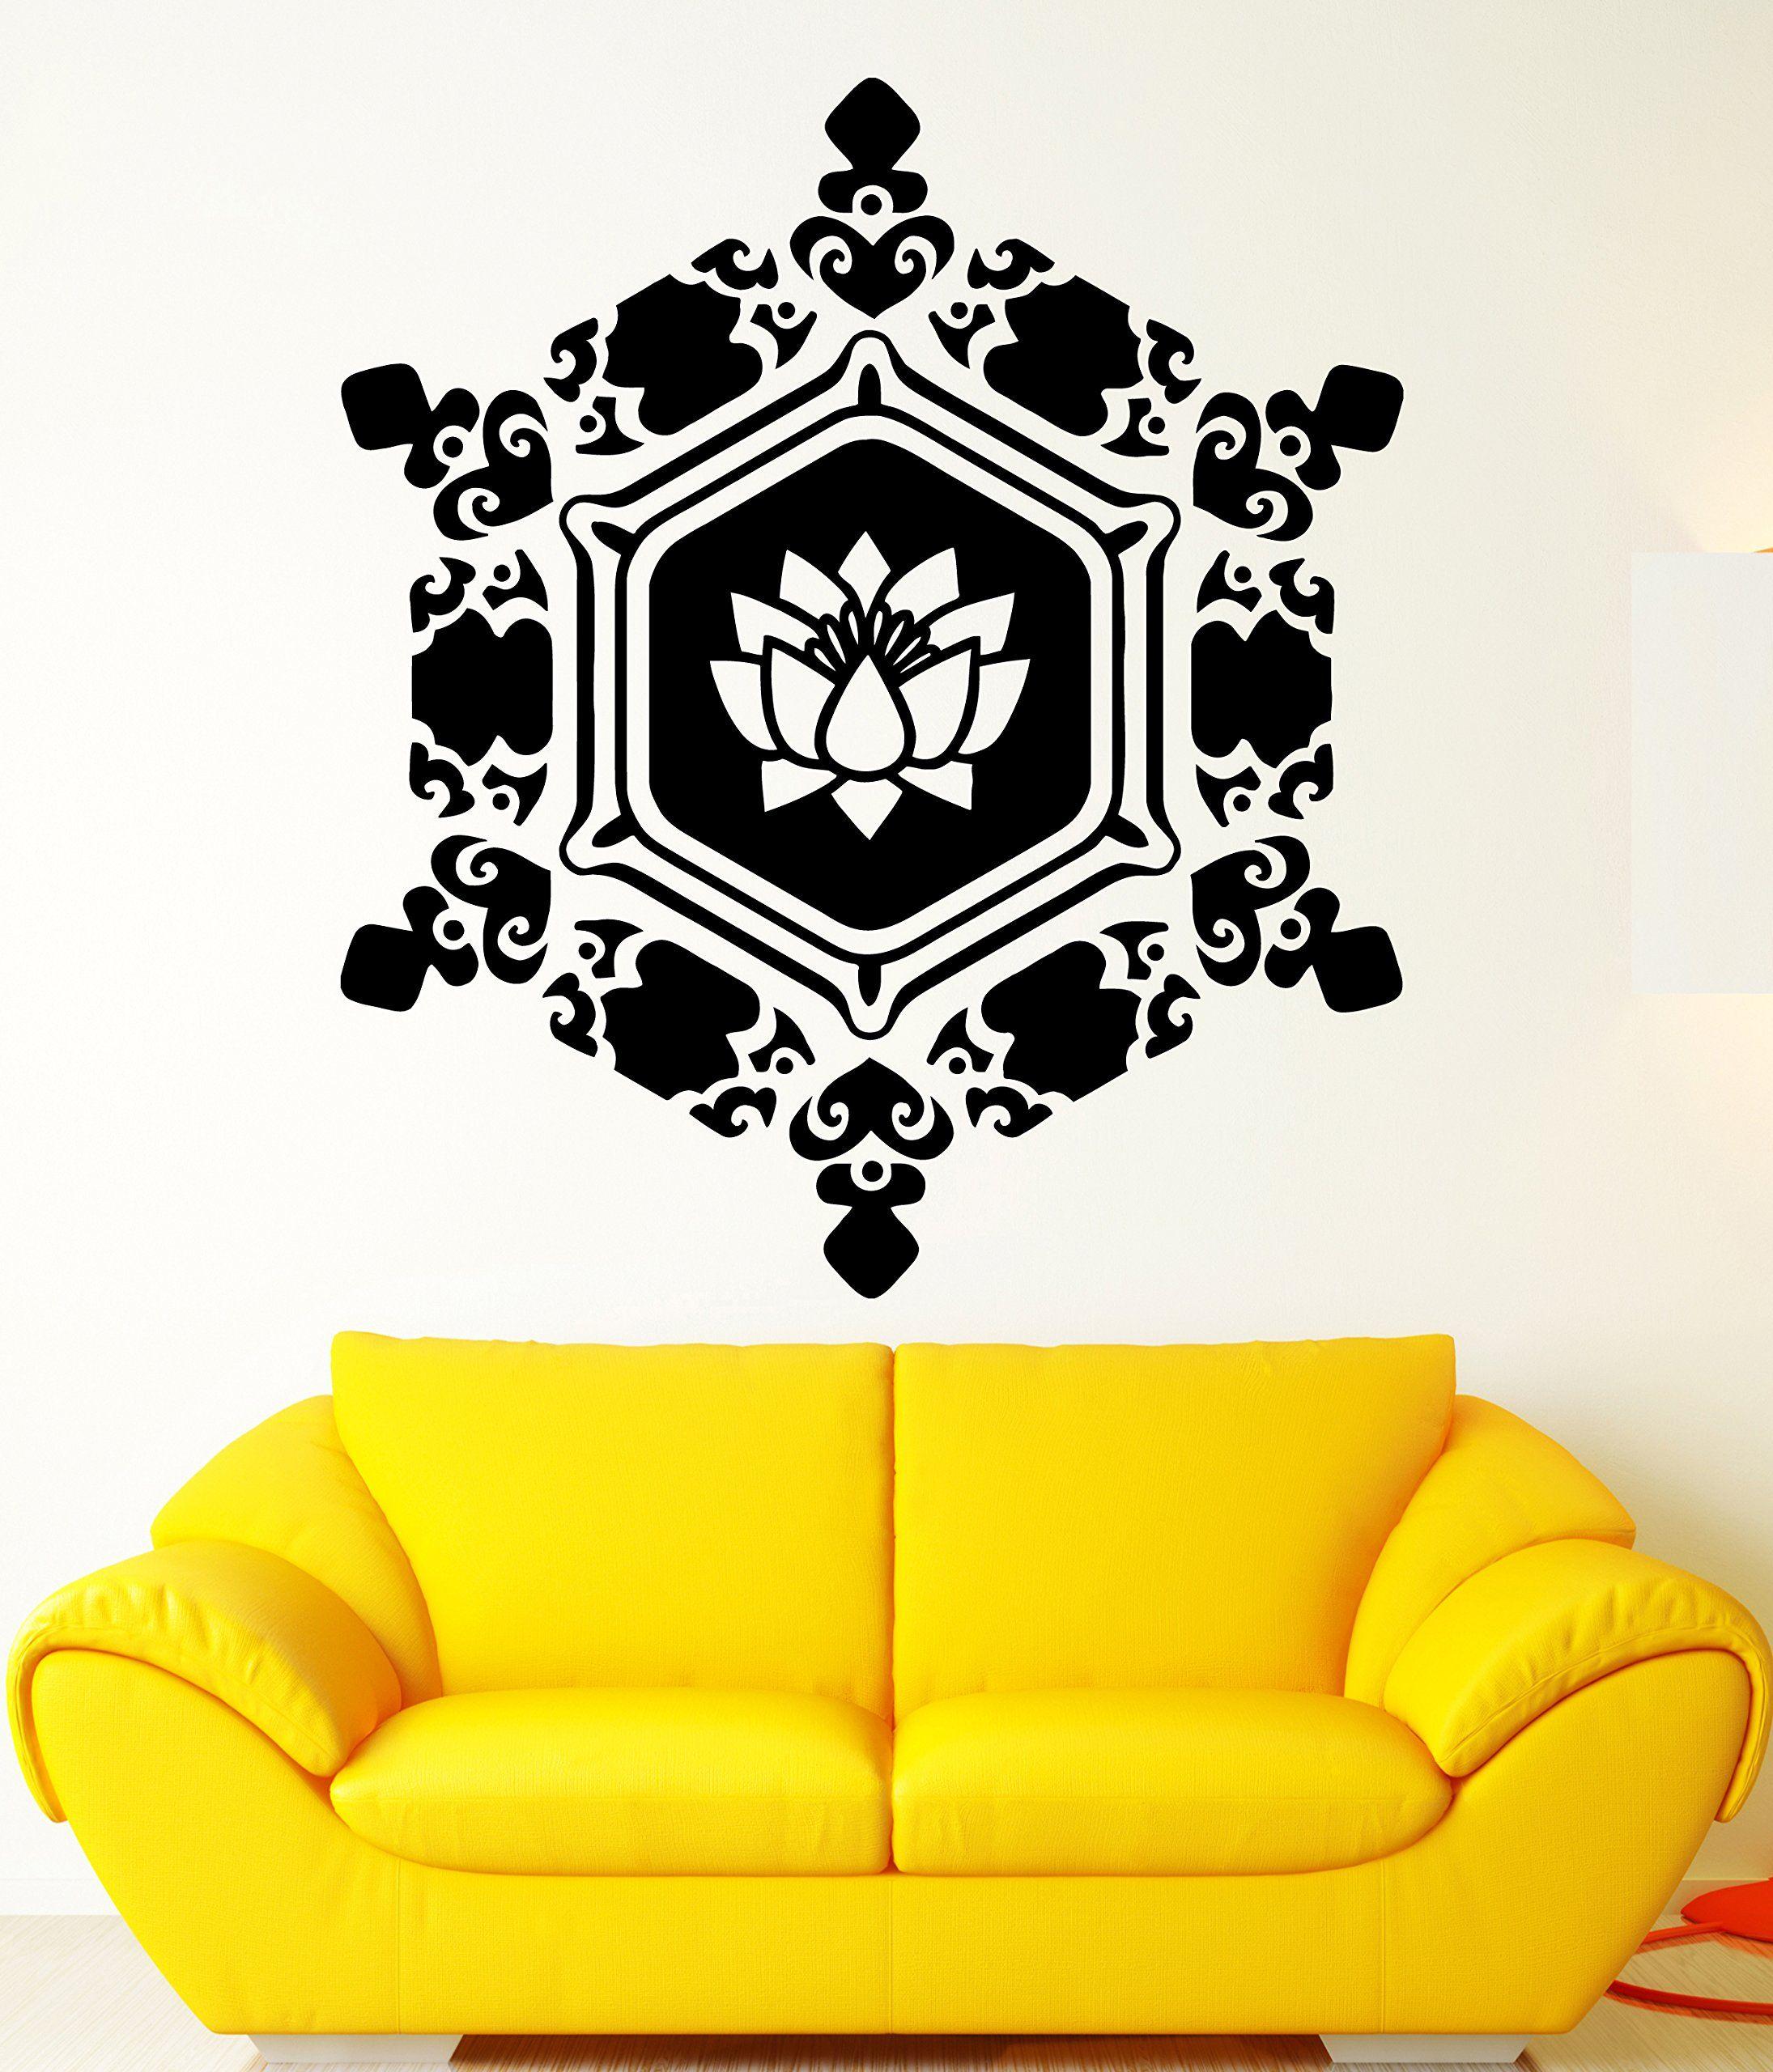 Amazoncom Mandala Wall Stickers Zen Buddhism Om Lotus Vinyl - Zen wall decalsvinyl wall decal yin yang yoga zen meditation bedroom decor